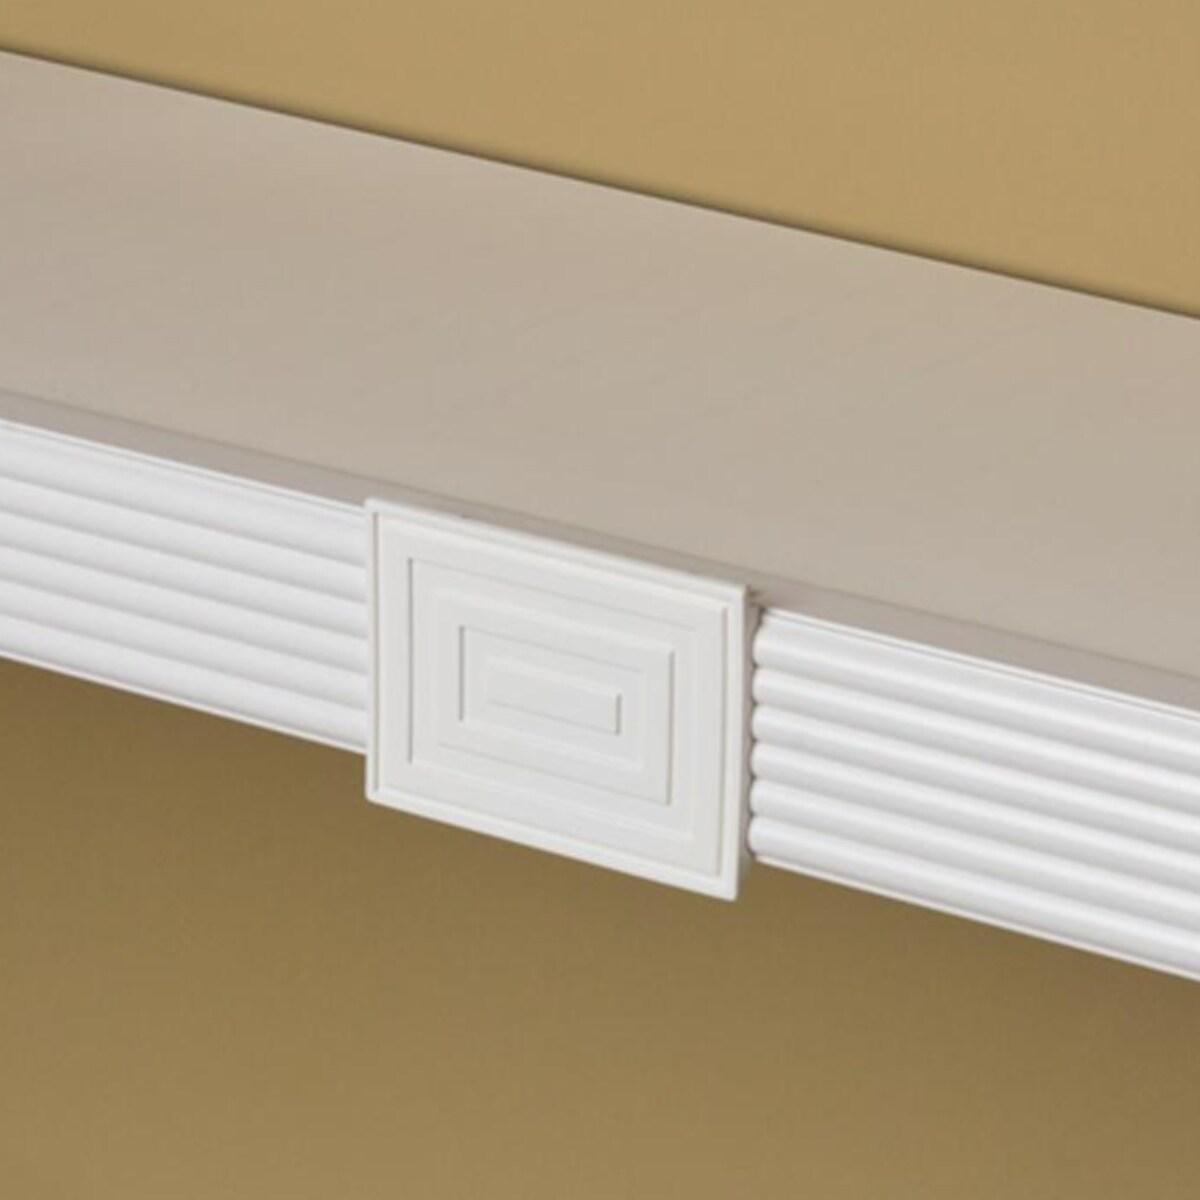 Help MyShelf Decorative Wire Shelf Cover